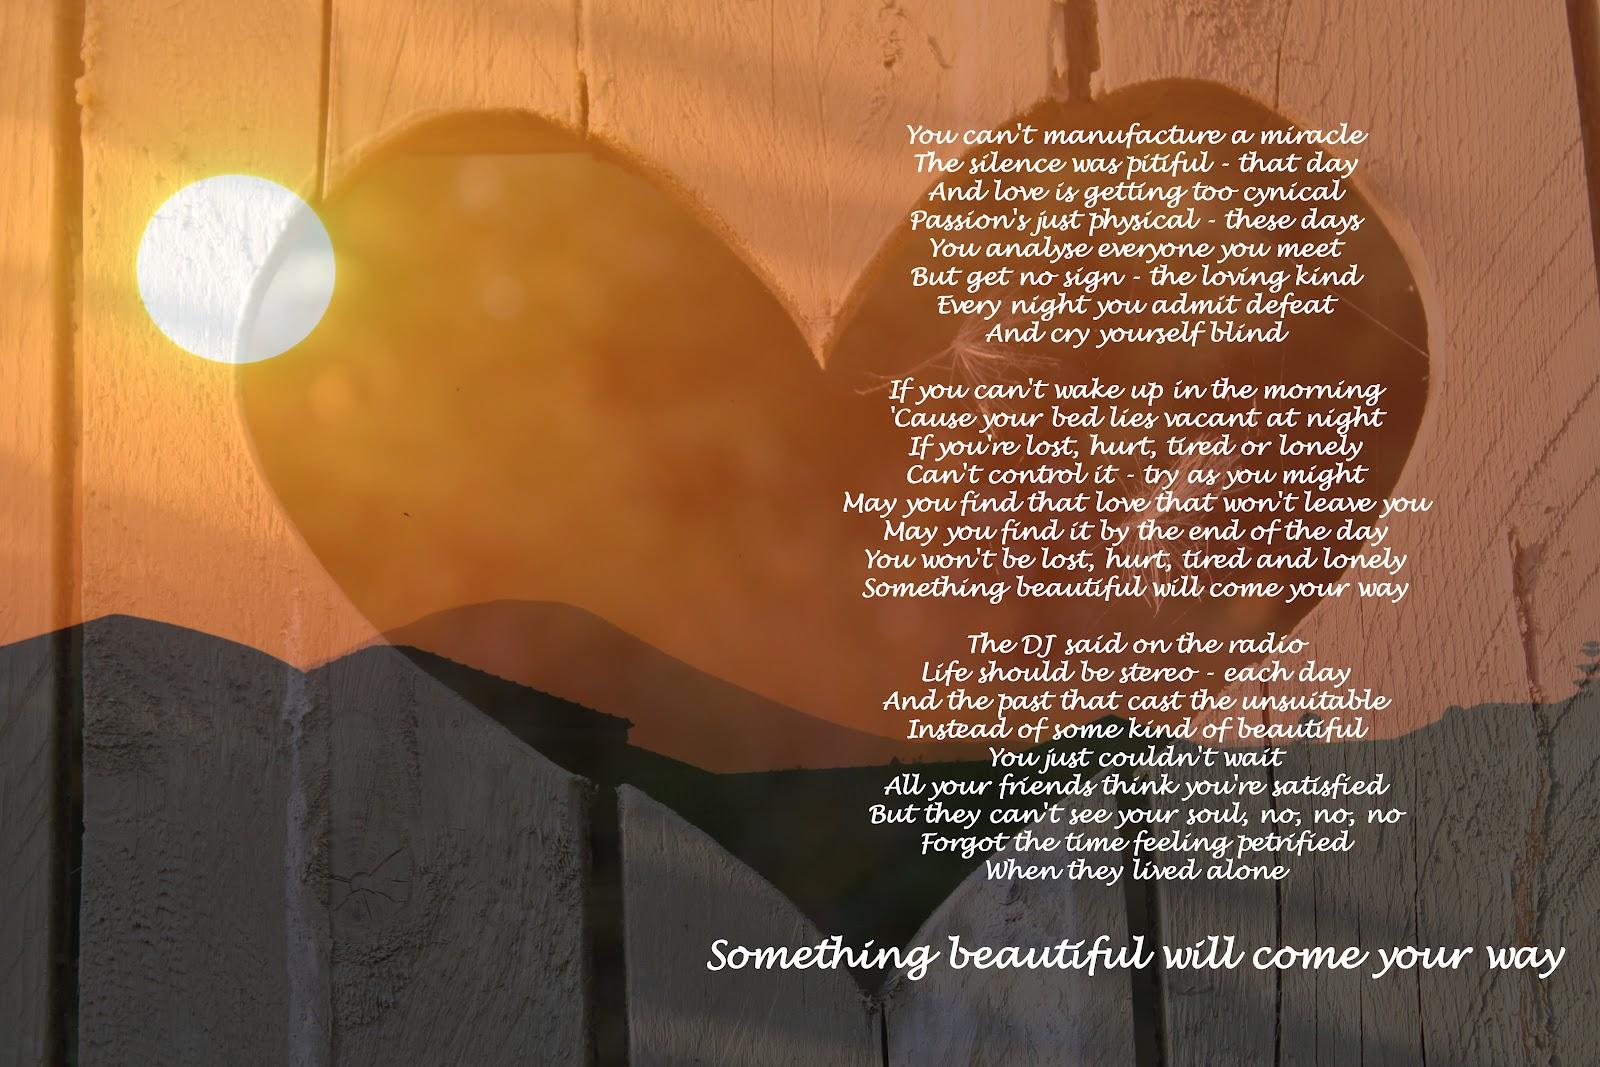 Something Beautiful from Alexi Murdoch lyrics - AlLyrics.net